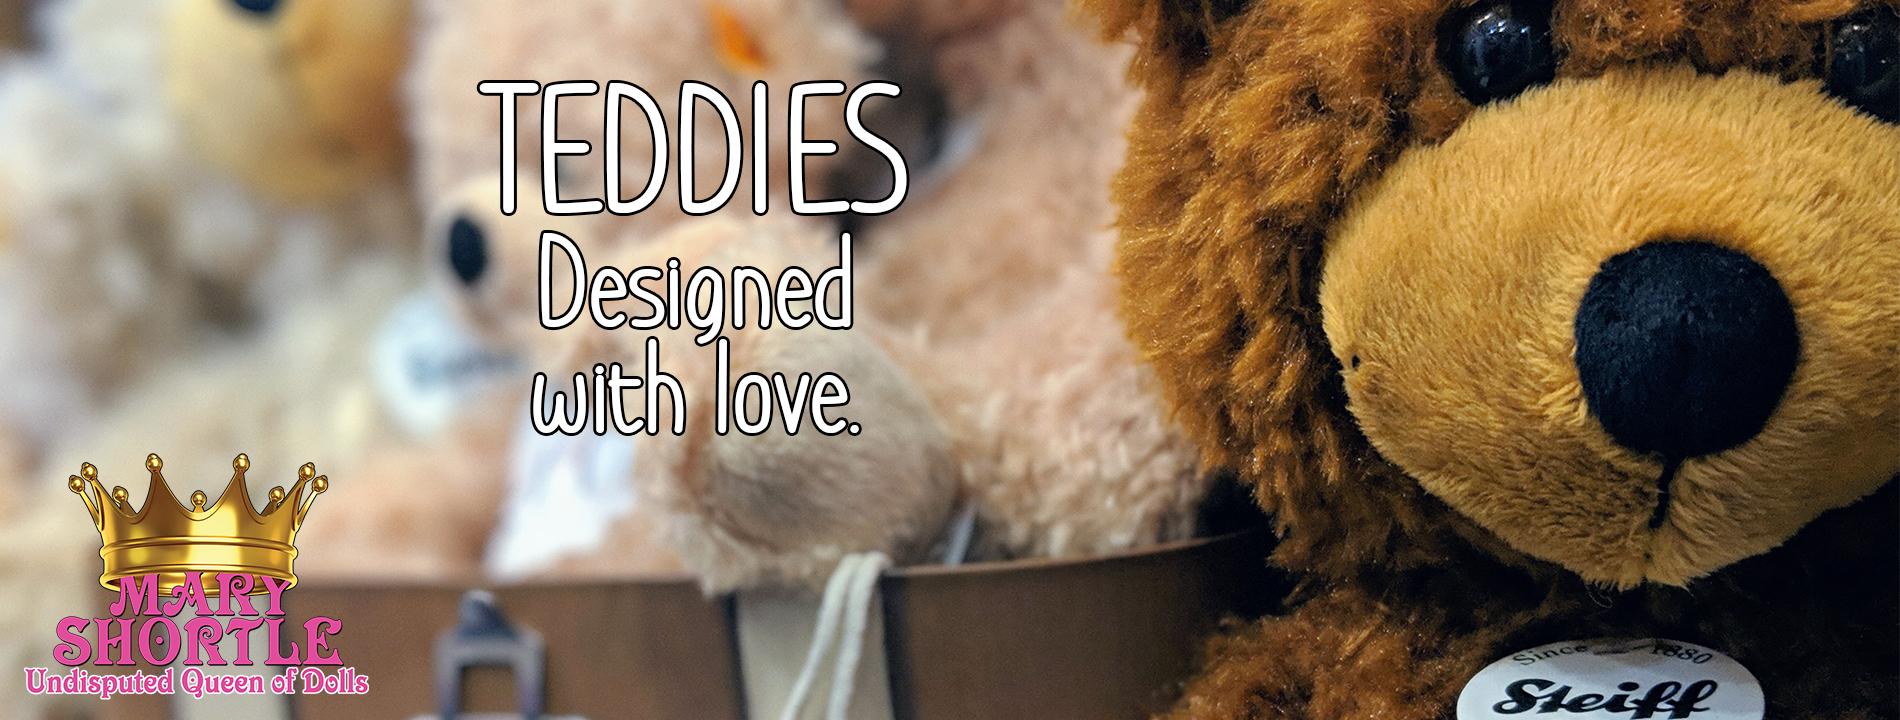 teddy slider